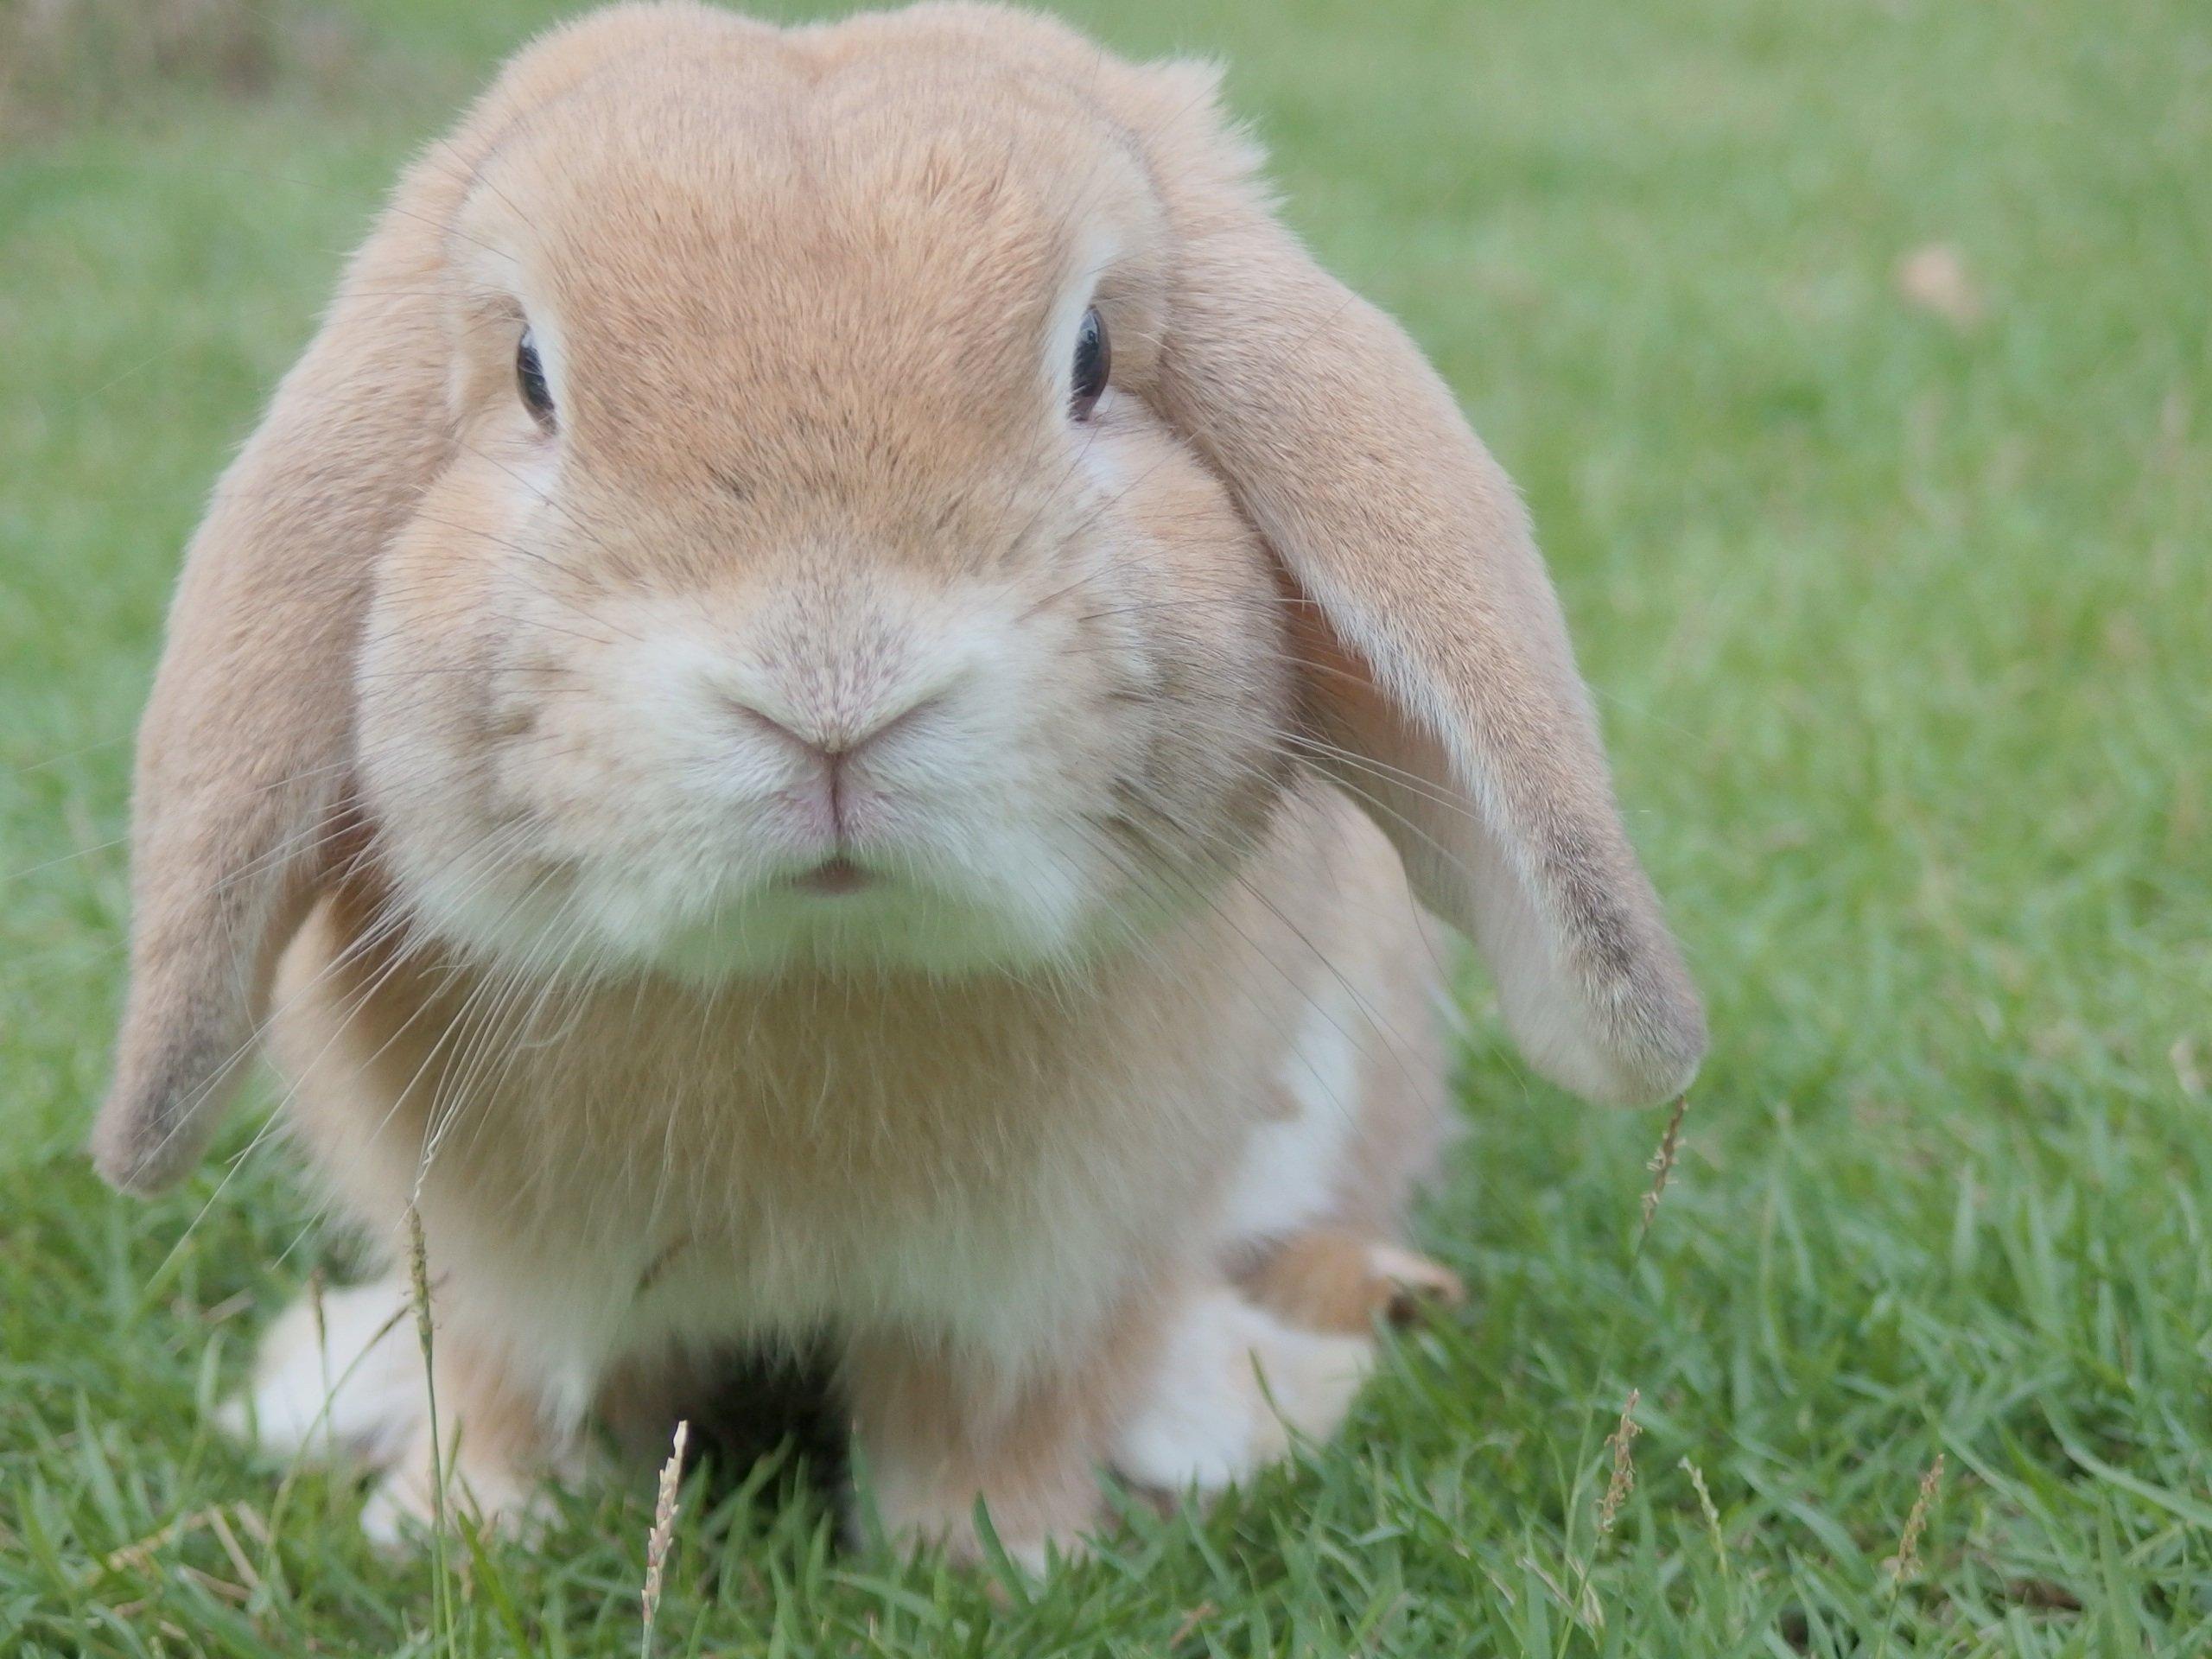 floppy ear rabbit sitting in grass